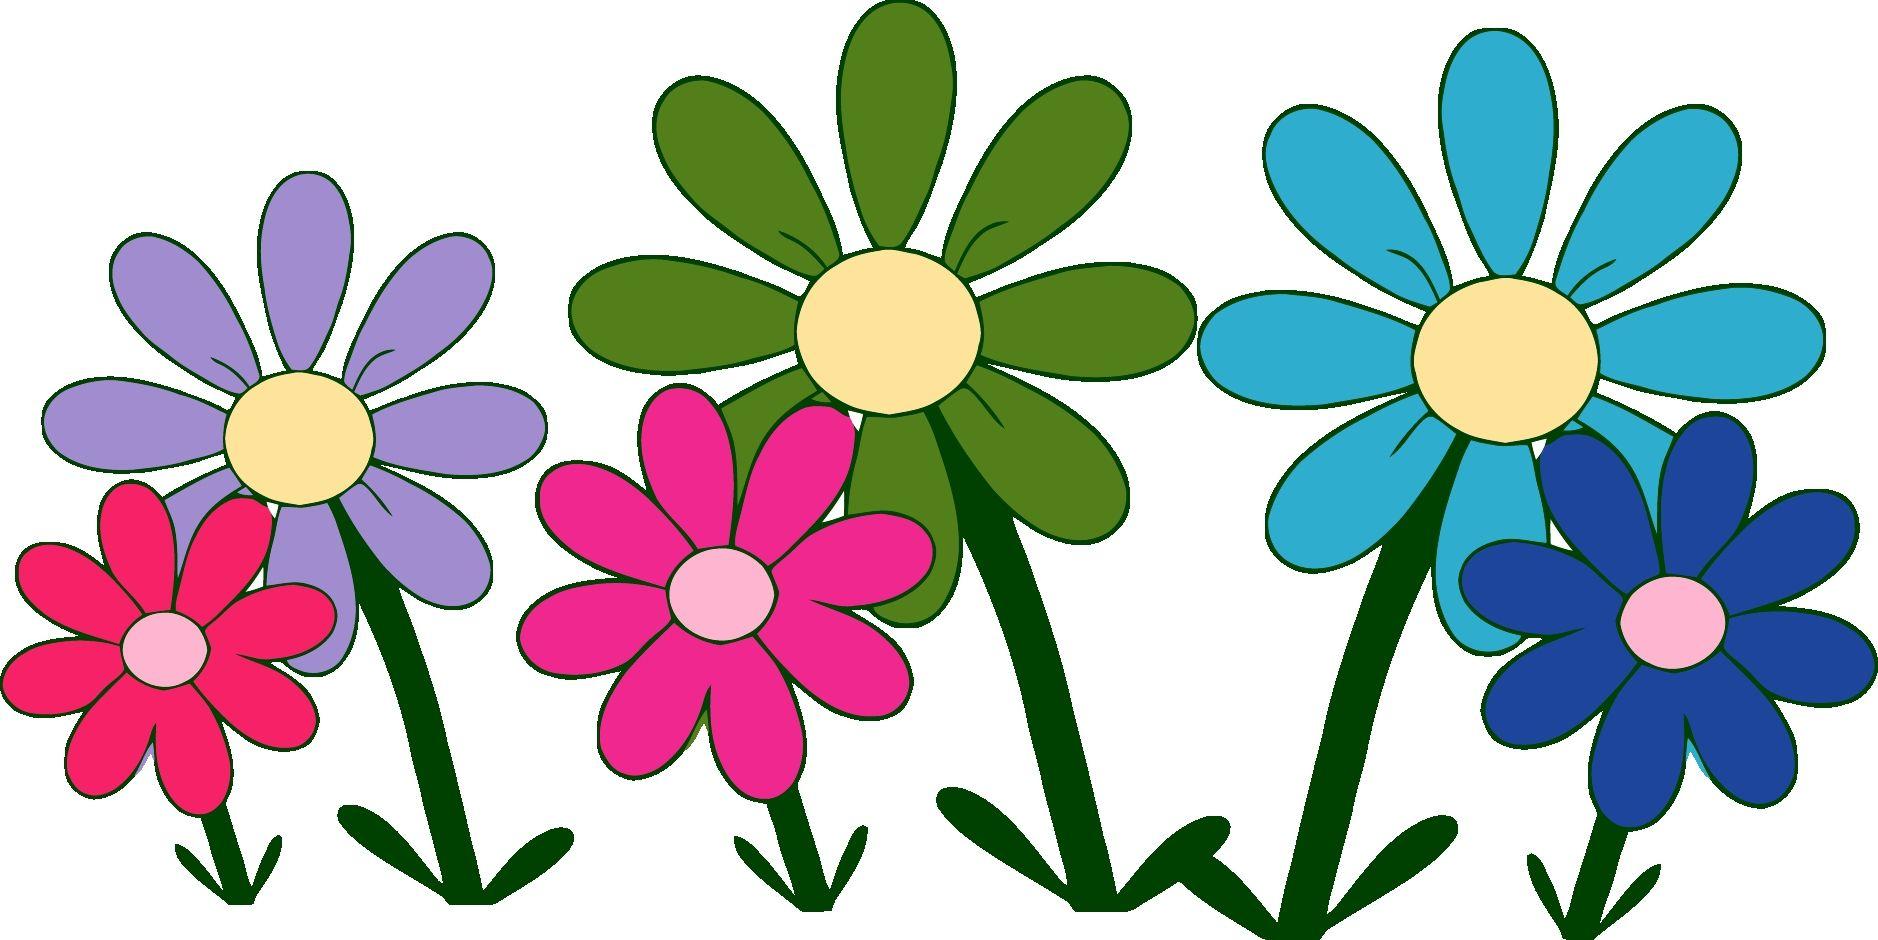 May Flowers Clipart | Flower illustration, Cartoon flowers, Flower art